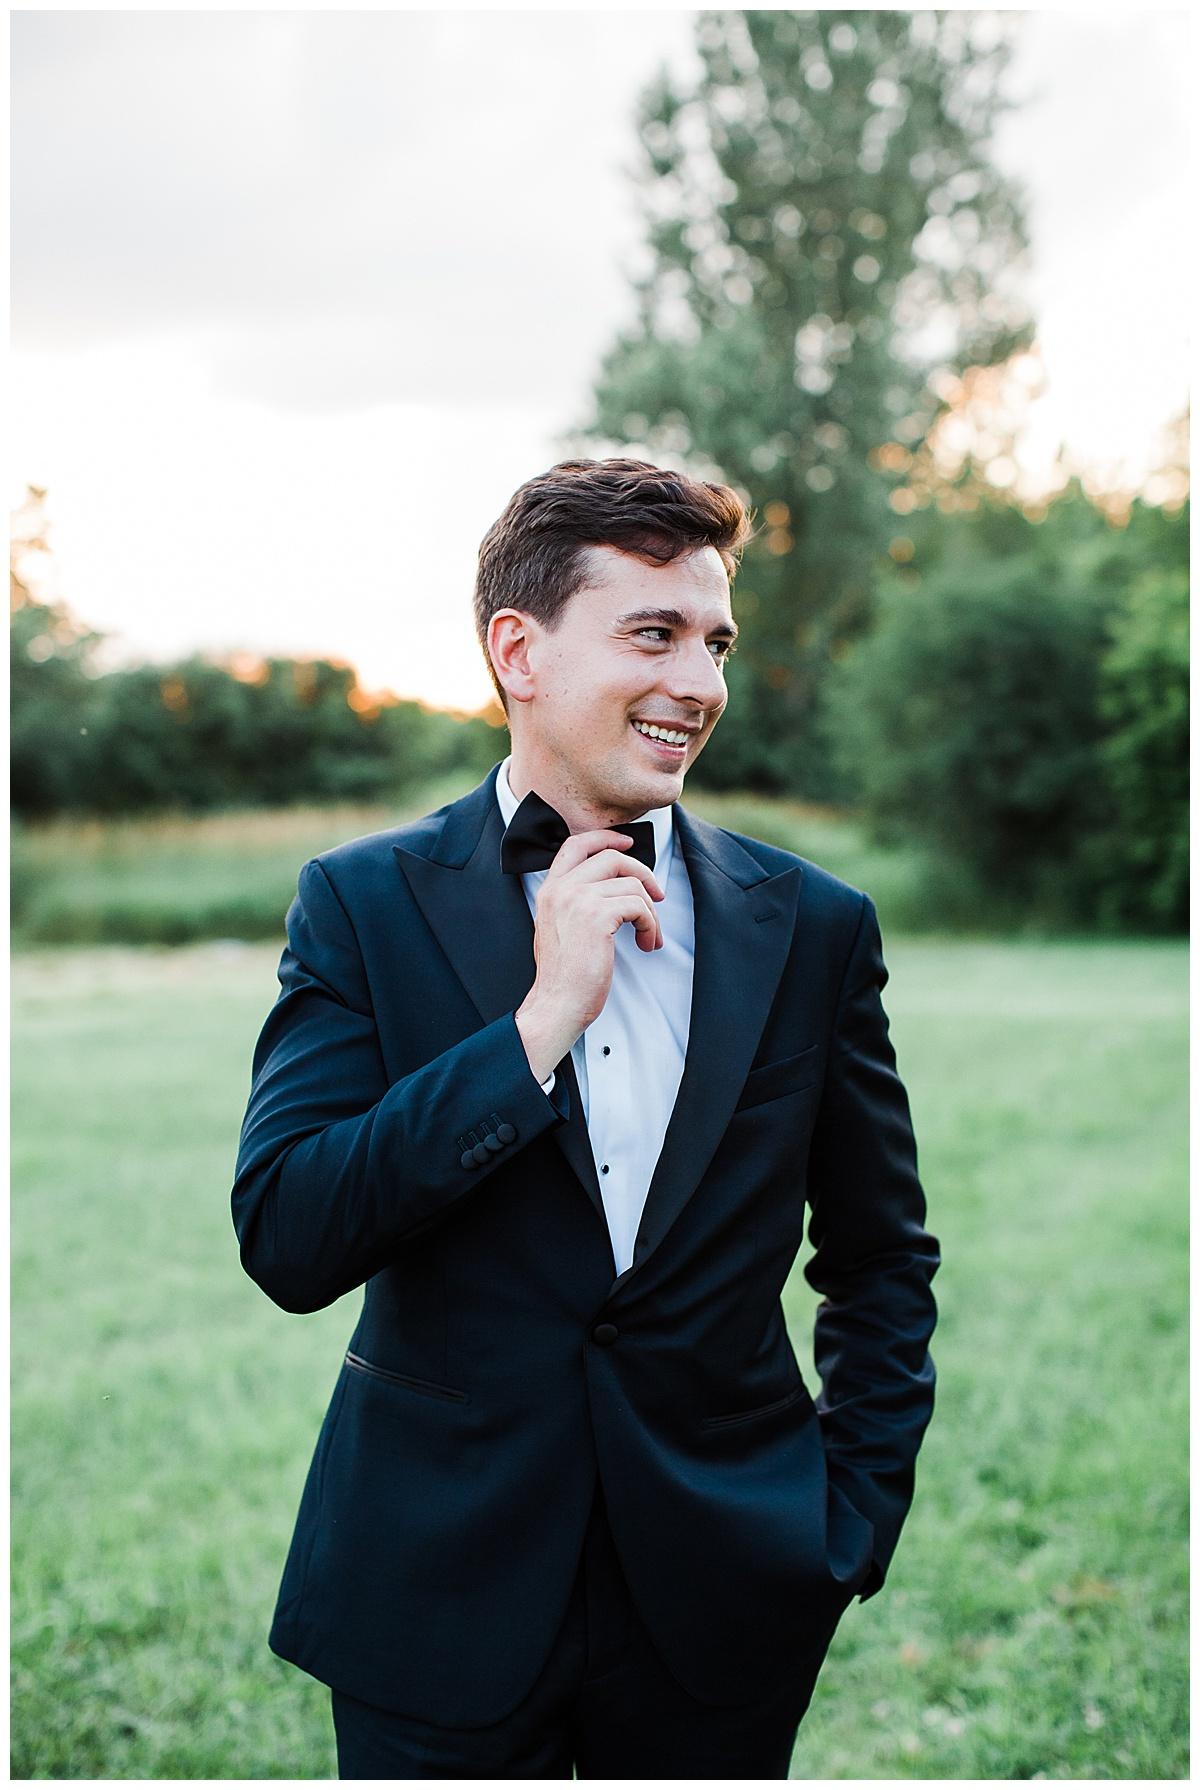 Groom portrait smiling and adjusting his bowtie  Georgetown, Ontario wedding  Toronto wedding photographer  3photography